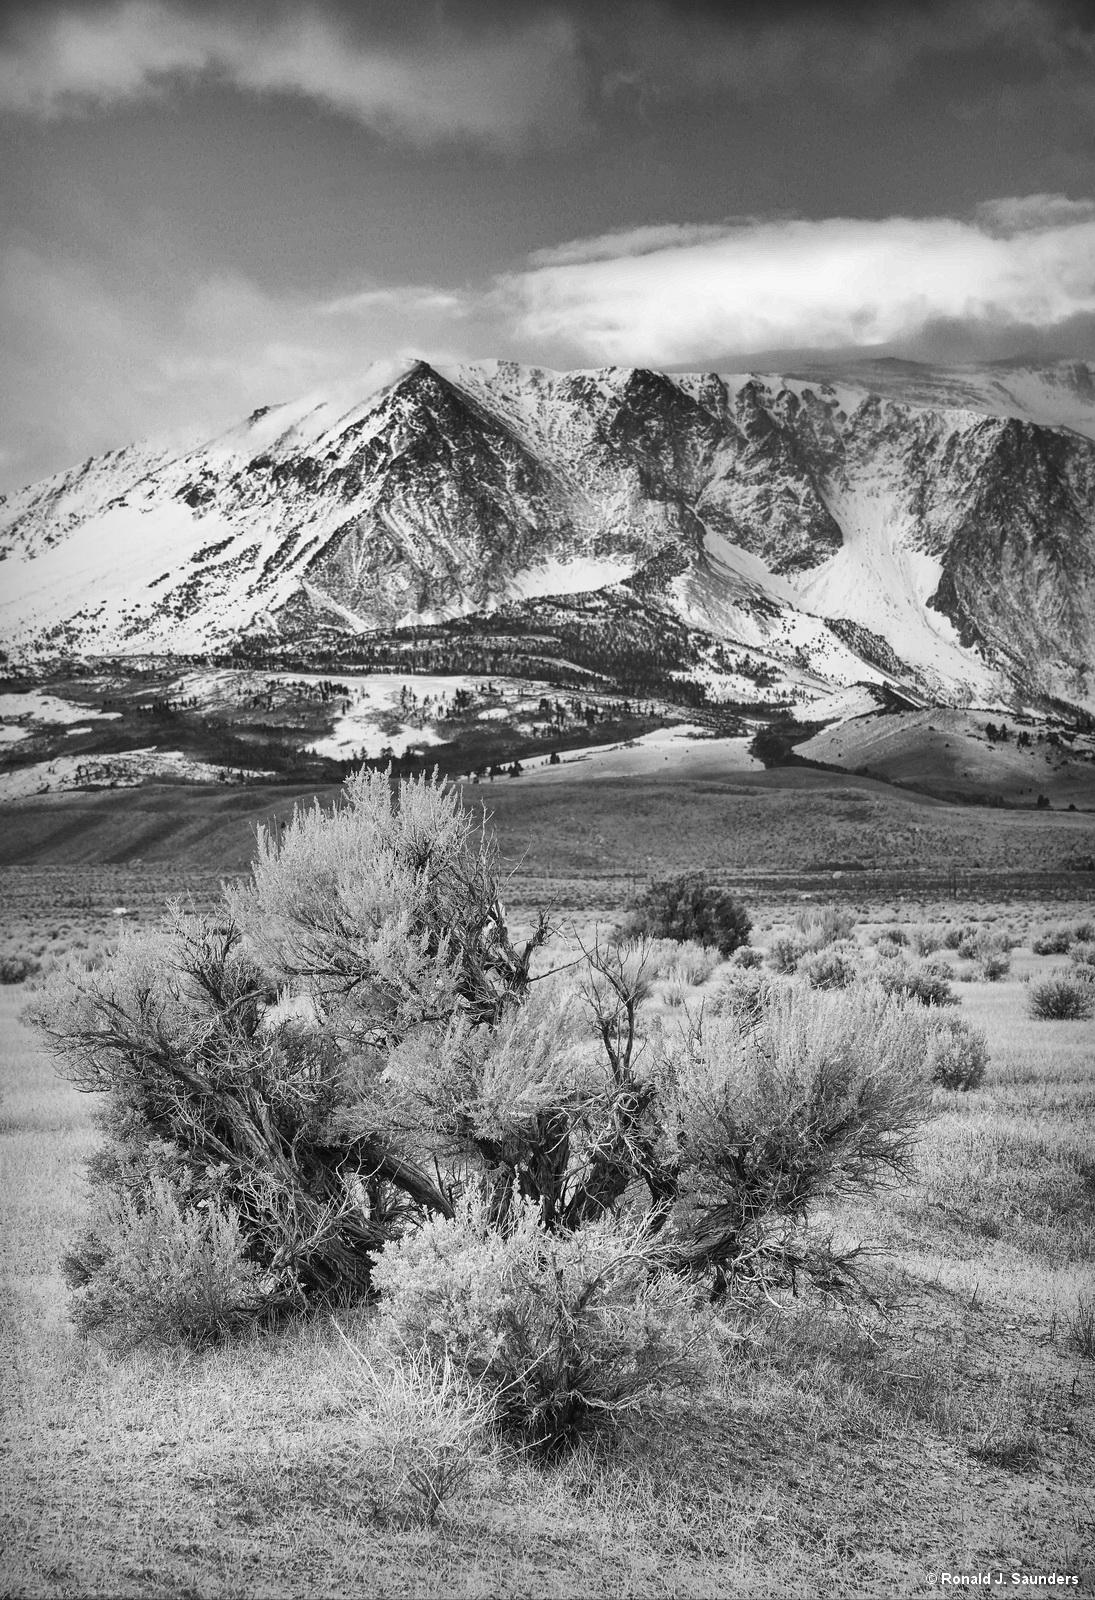 Mt Gibbs, ansel, adams, sexton, cramer, sierra, mountain, black, white, sage, pumice, photo